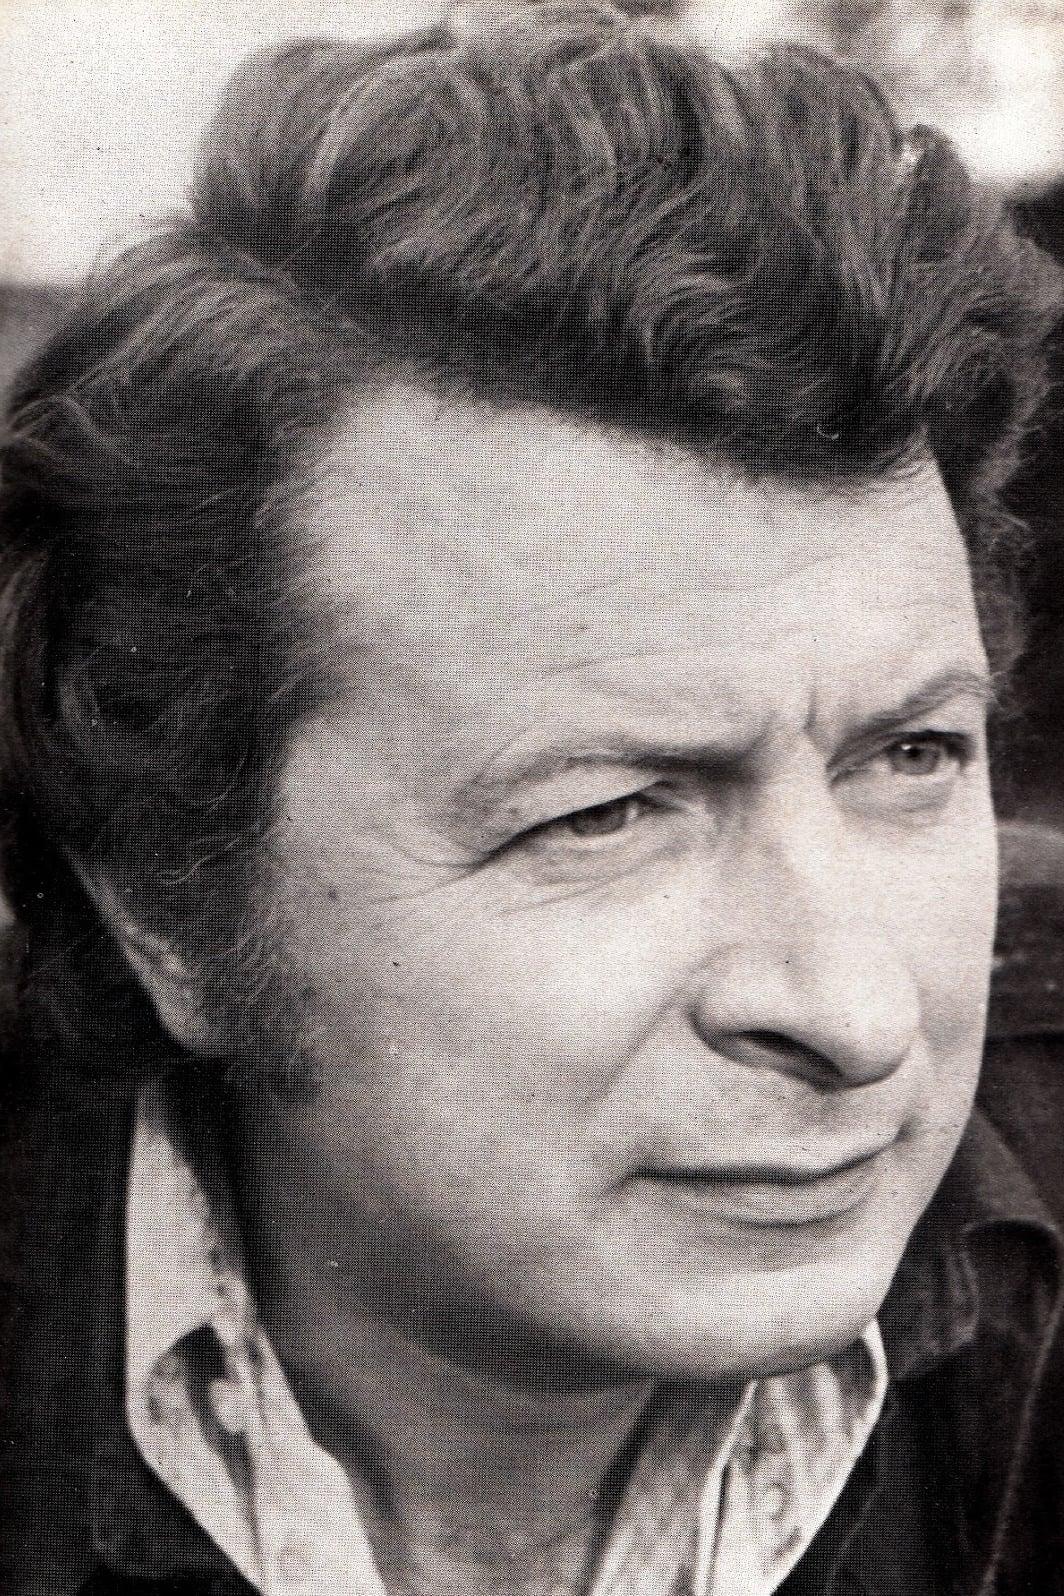 Gheorghe Șimonca